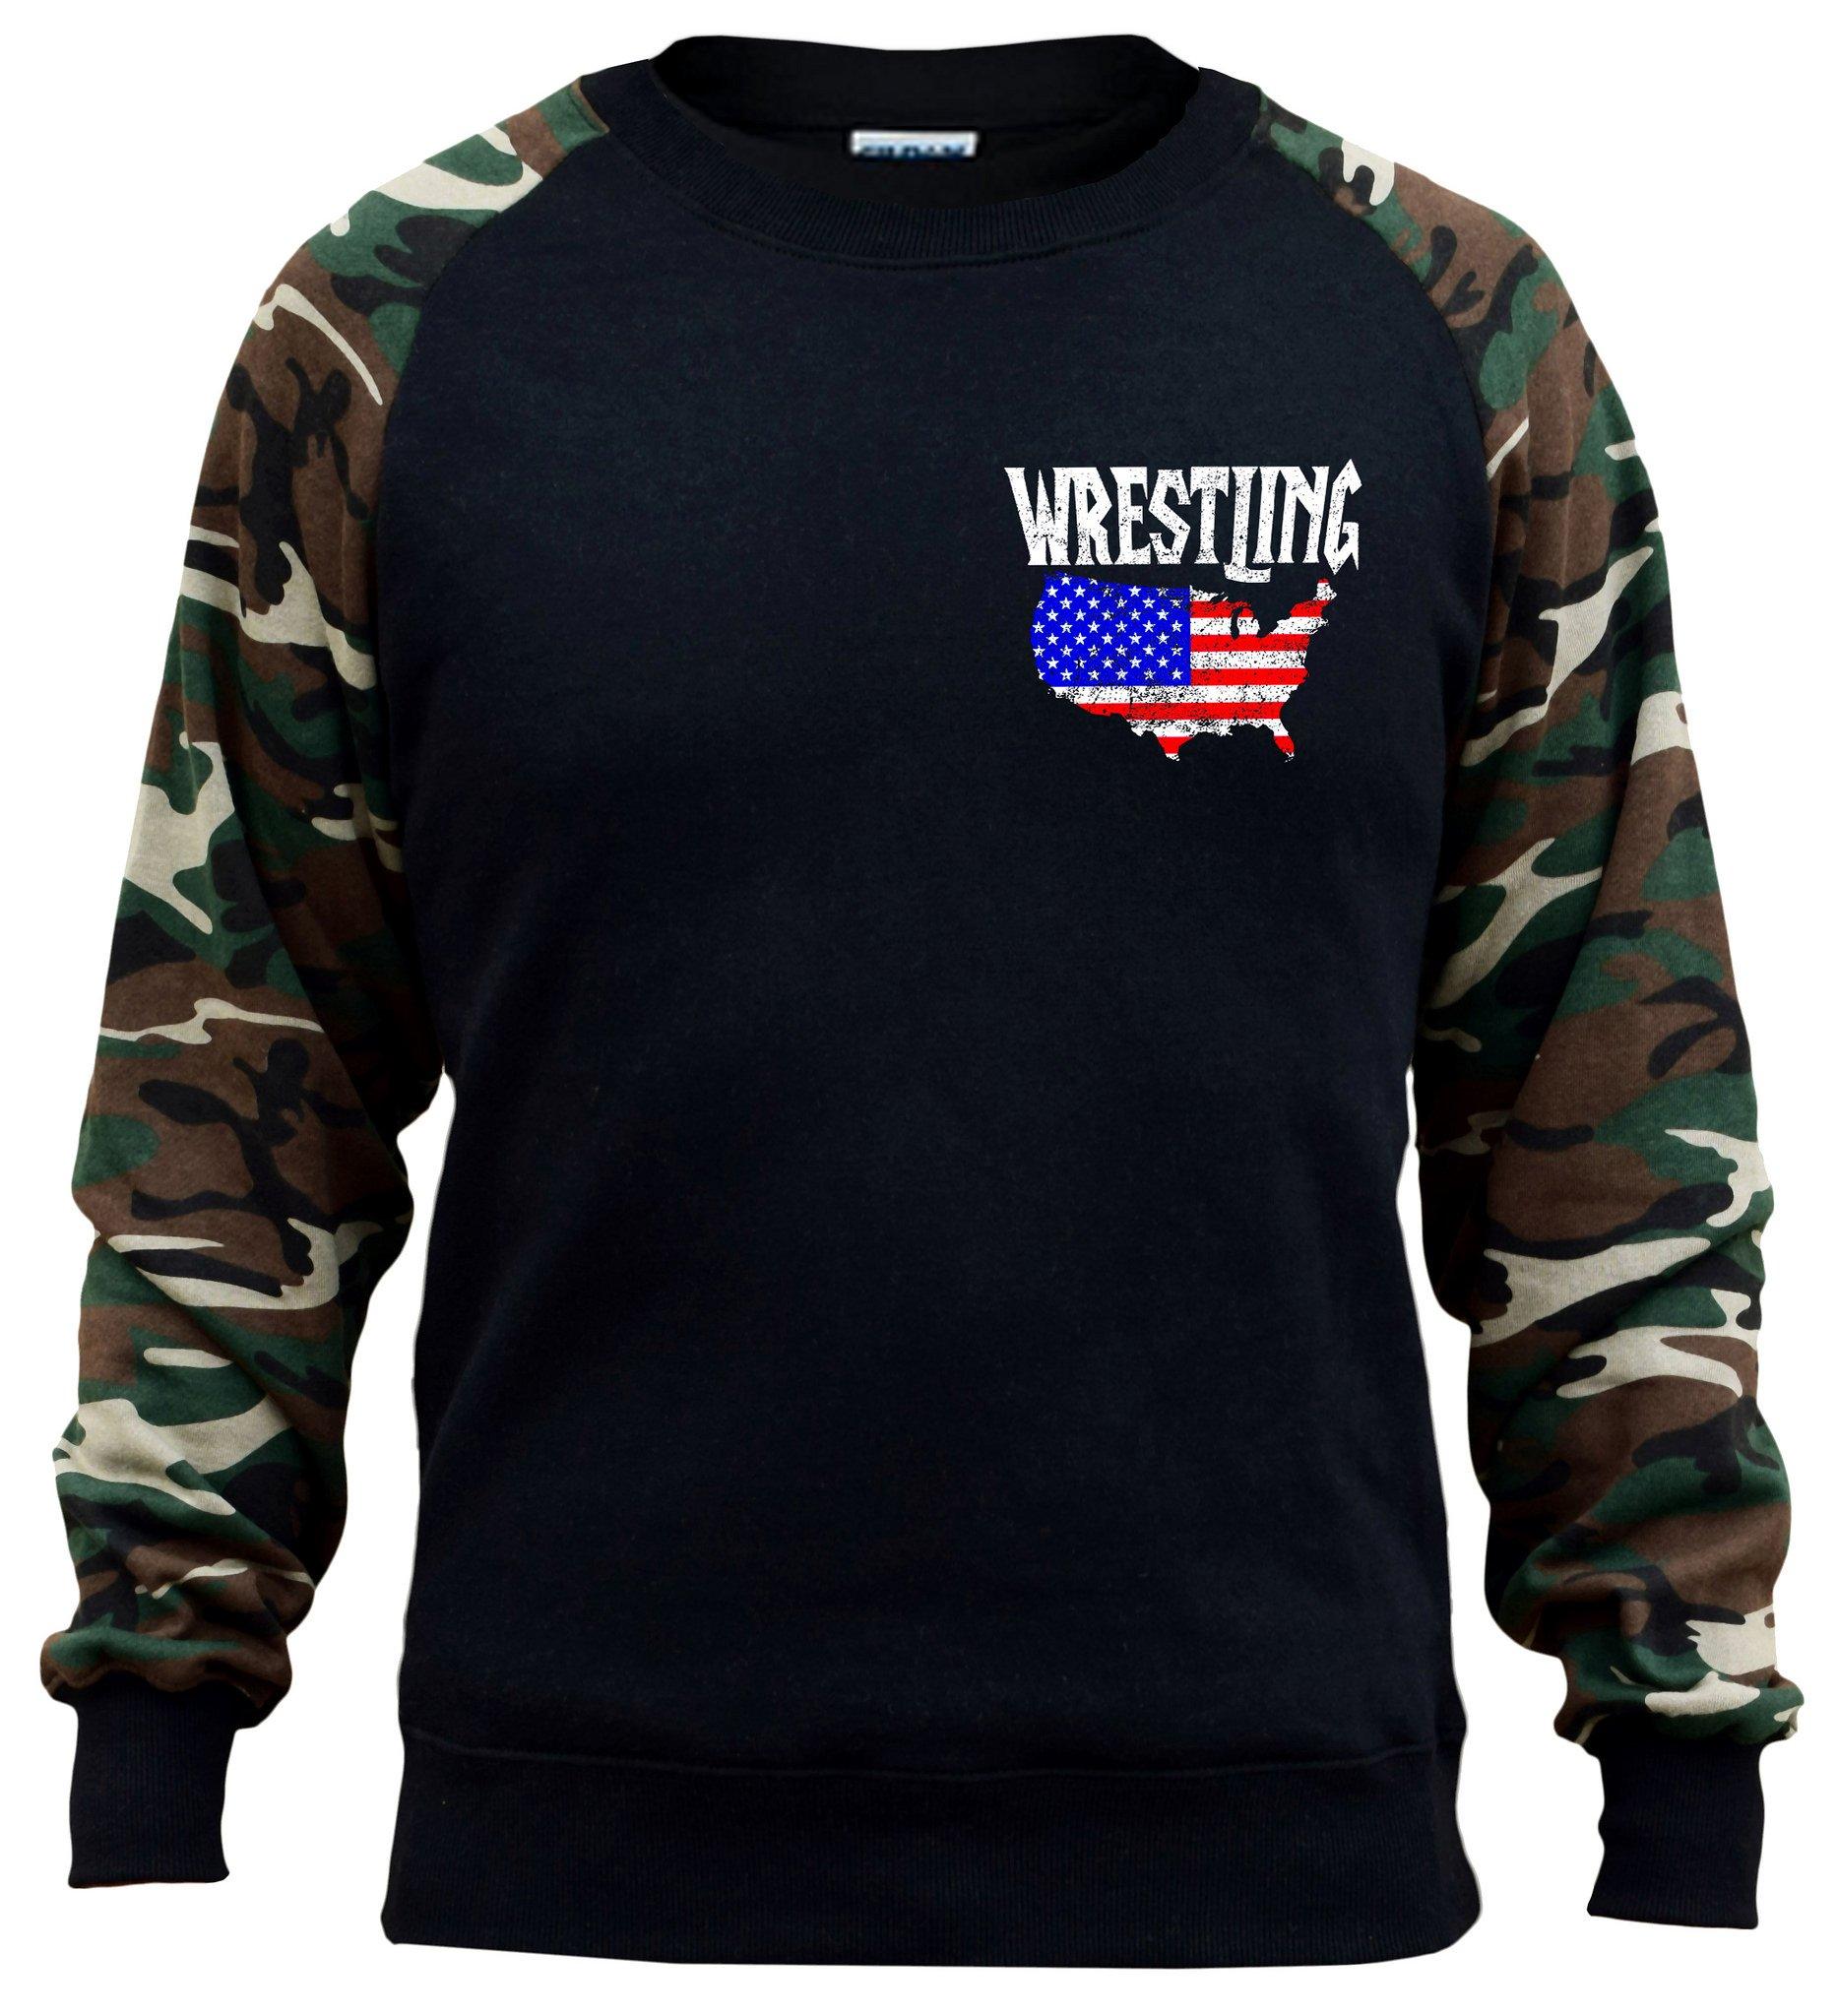 Interstate Apparel Men's Wrestling American Flag Map Black/Camo Raglan Baseball Sweatshirt Large Black